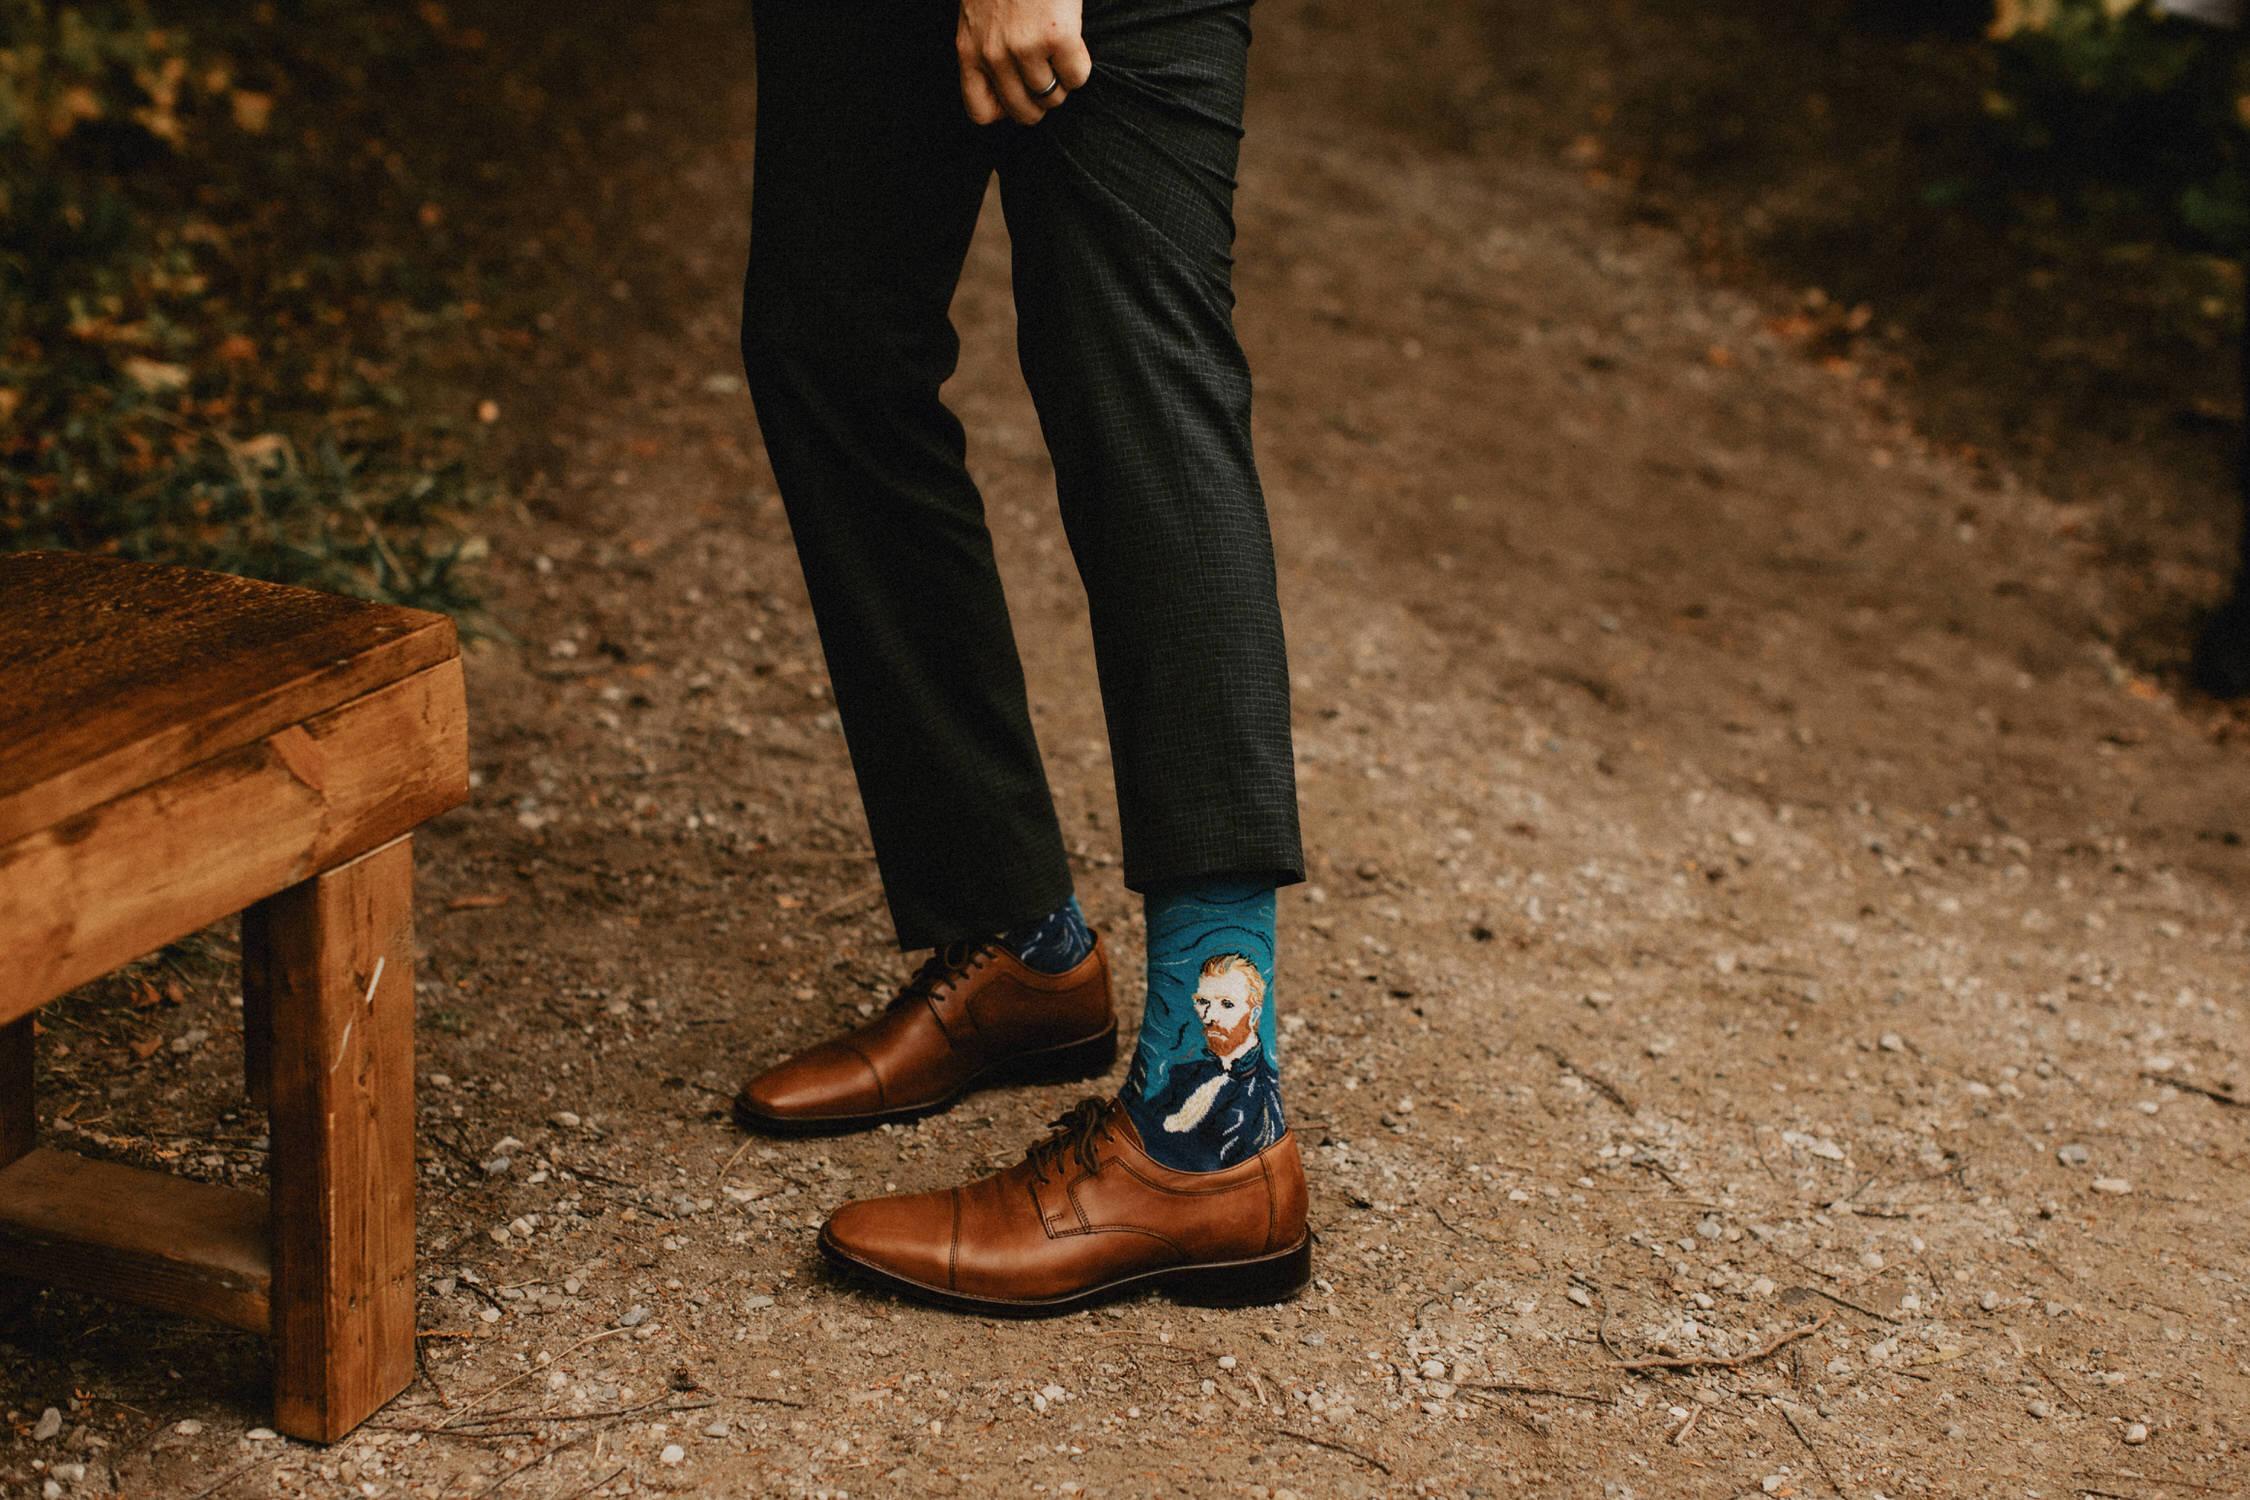 Groom with Van Gogh Socks - Huron Natural Area Micro Wedding Kitchener, Ontario